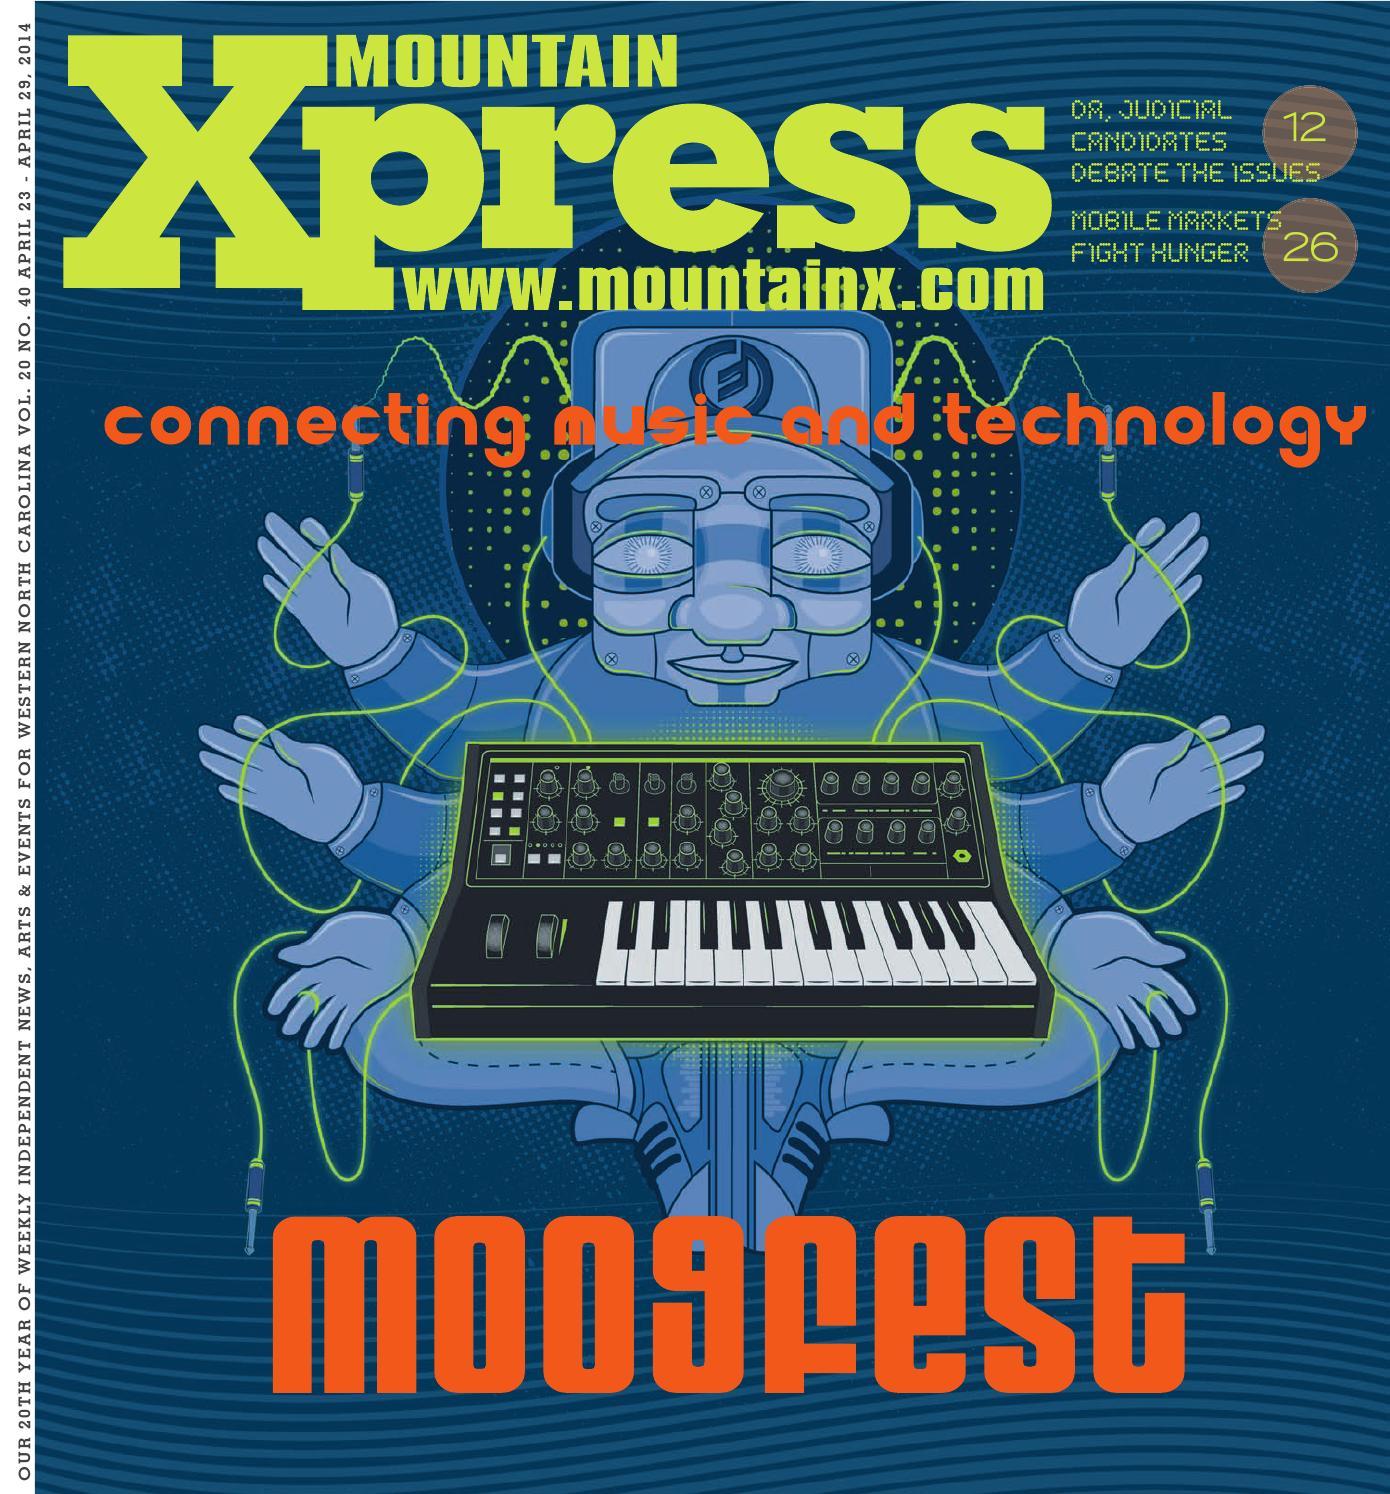 Mountain Xpress 04 23 14 by Mountain Xpress - issuu